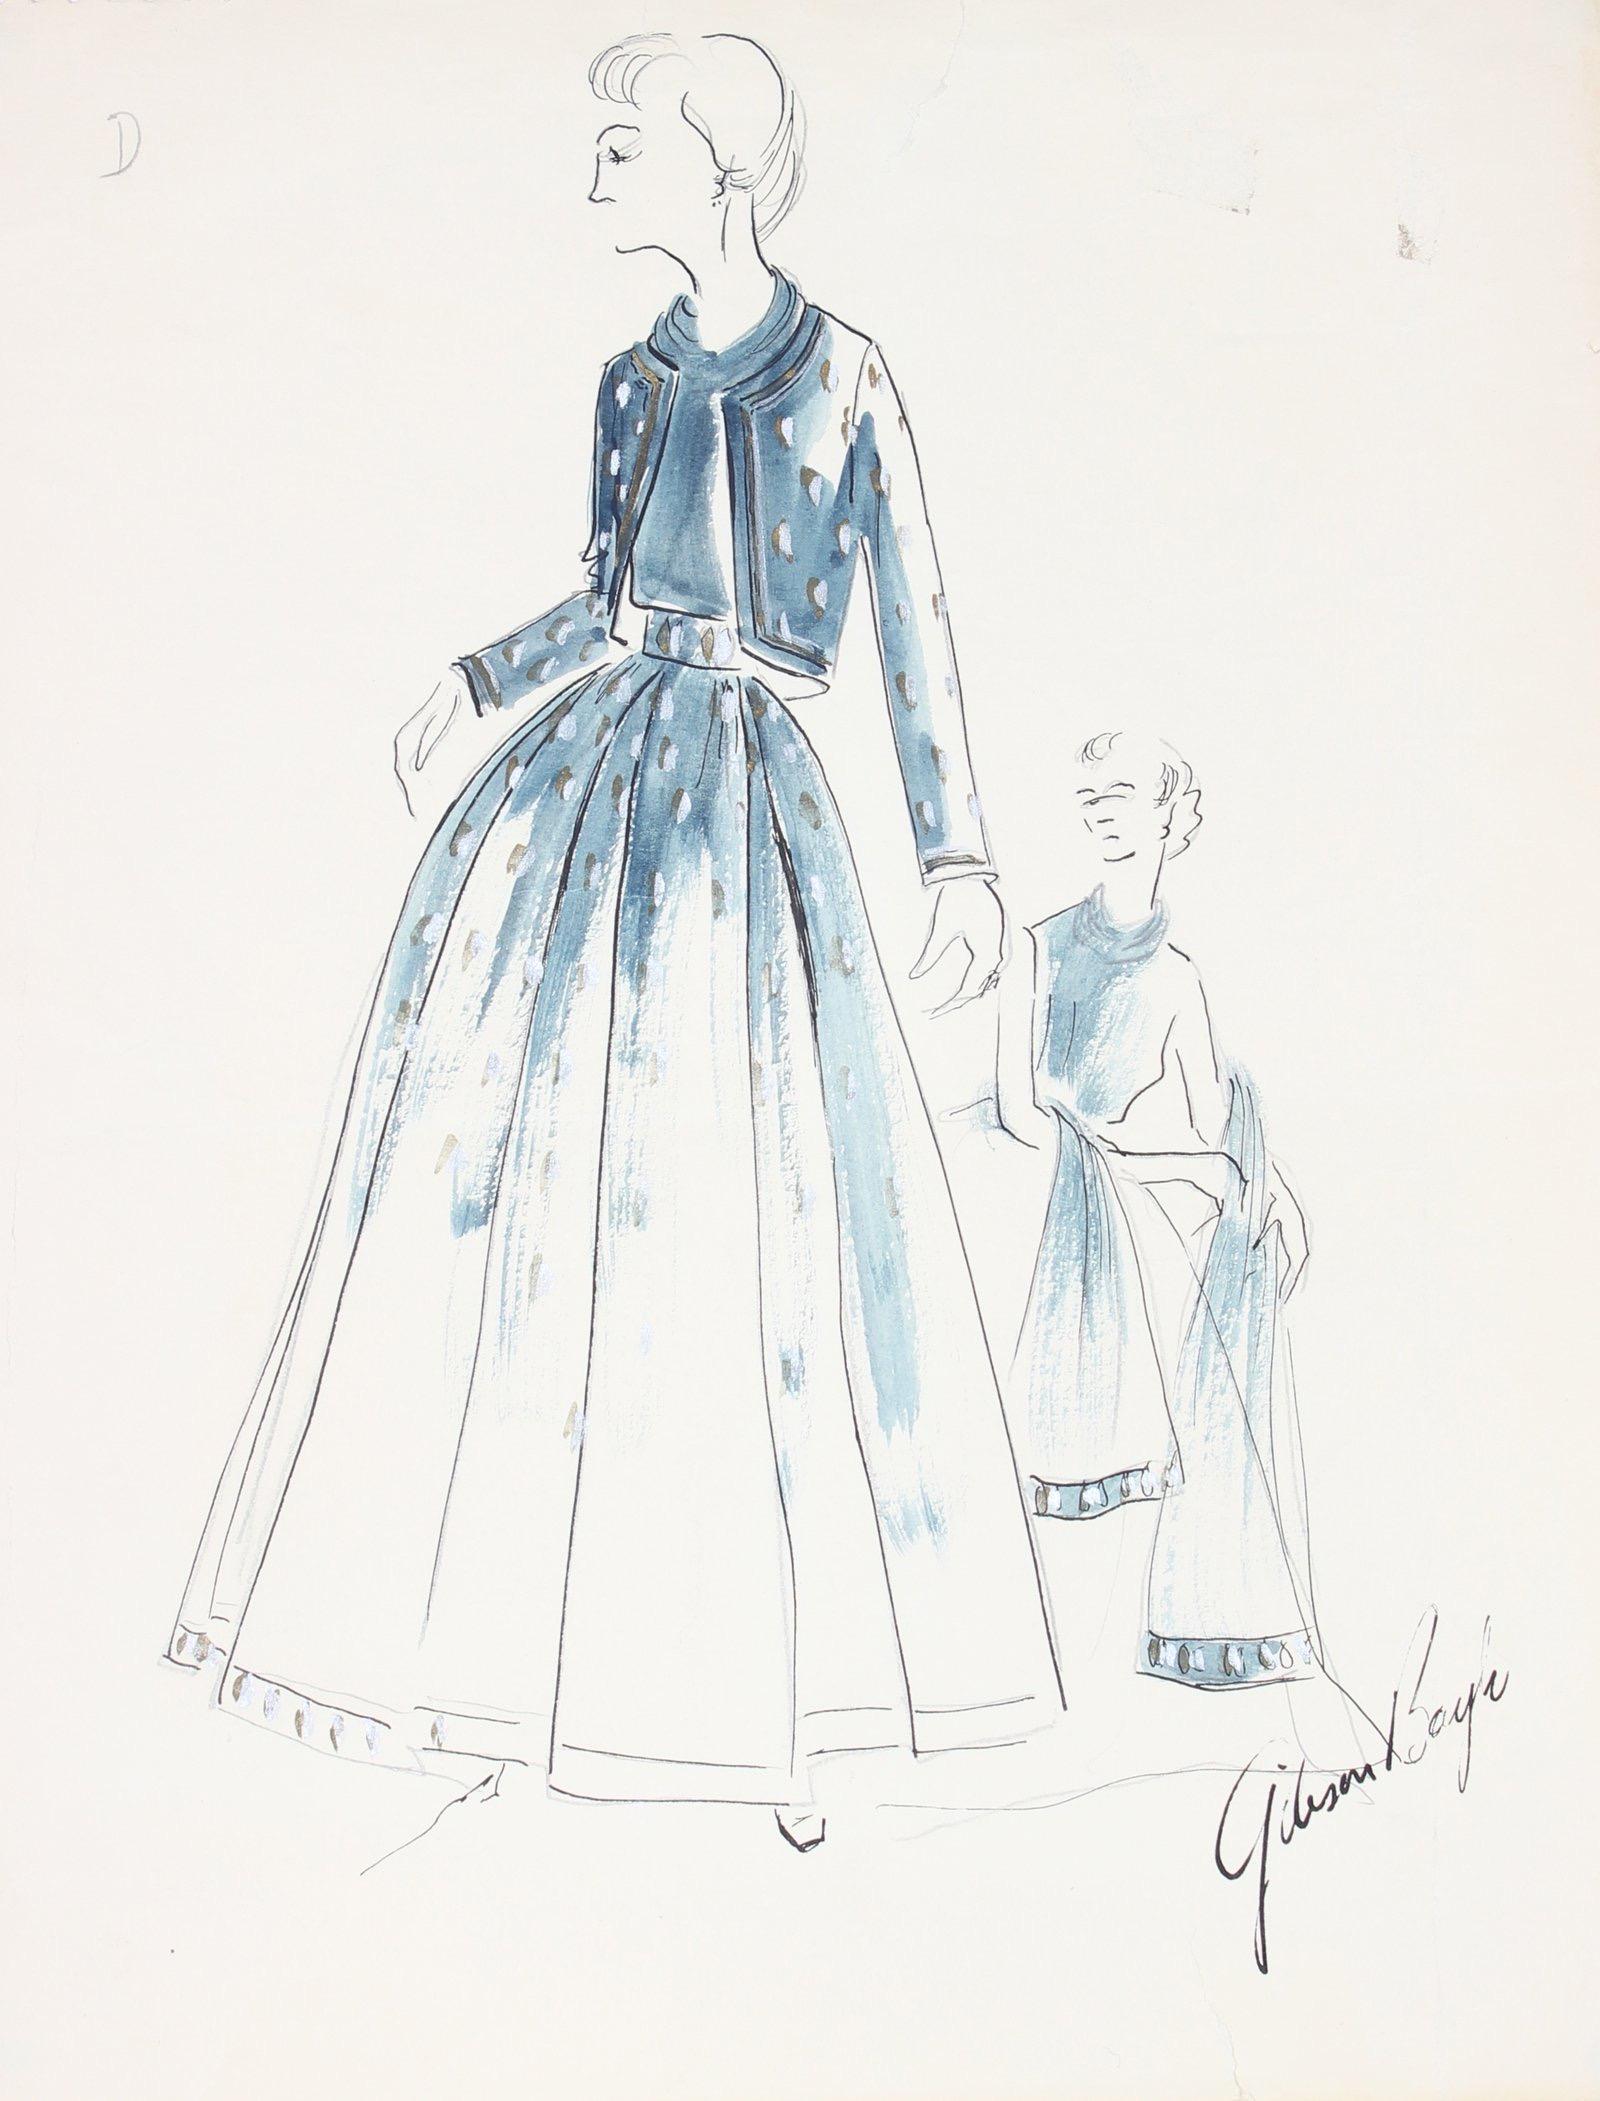 Belted Navy Blue Dress Gouache & Ink Fashion Illustration